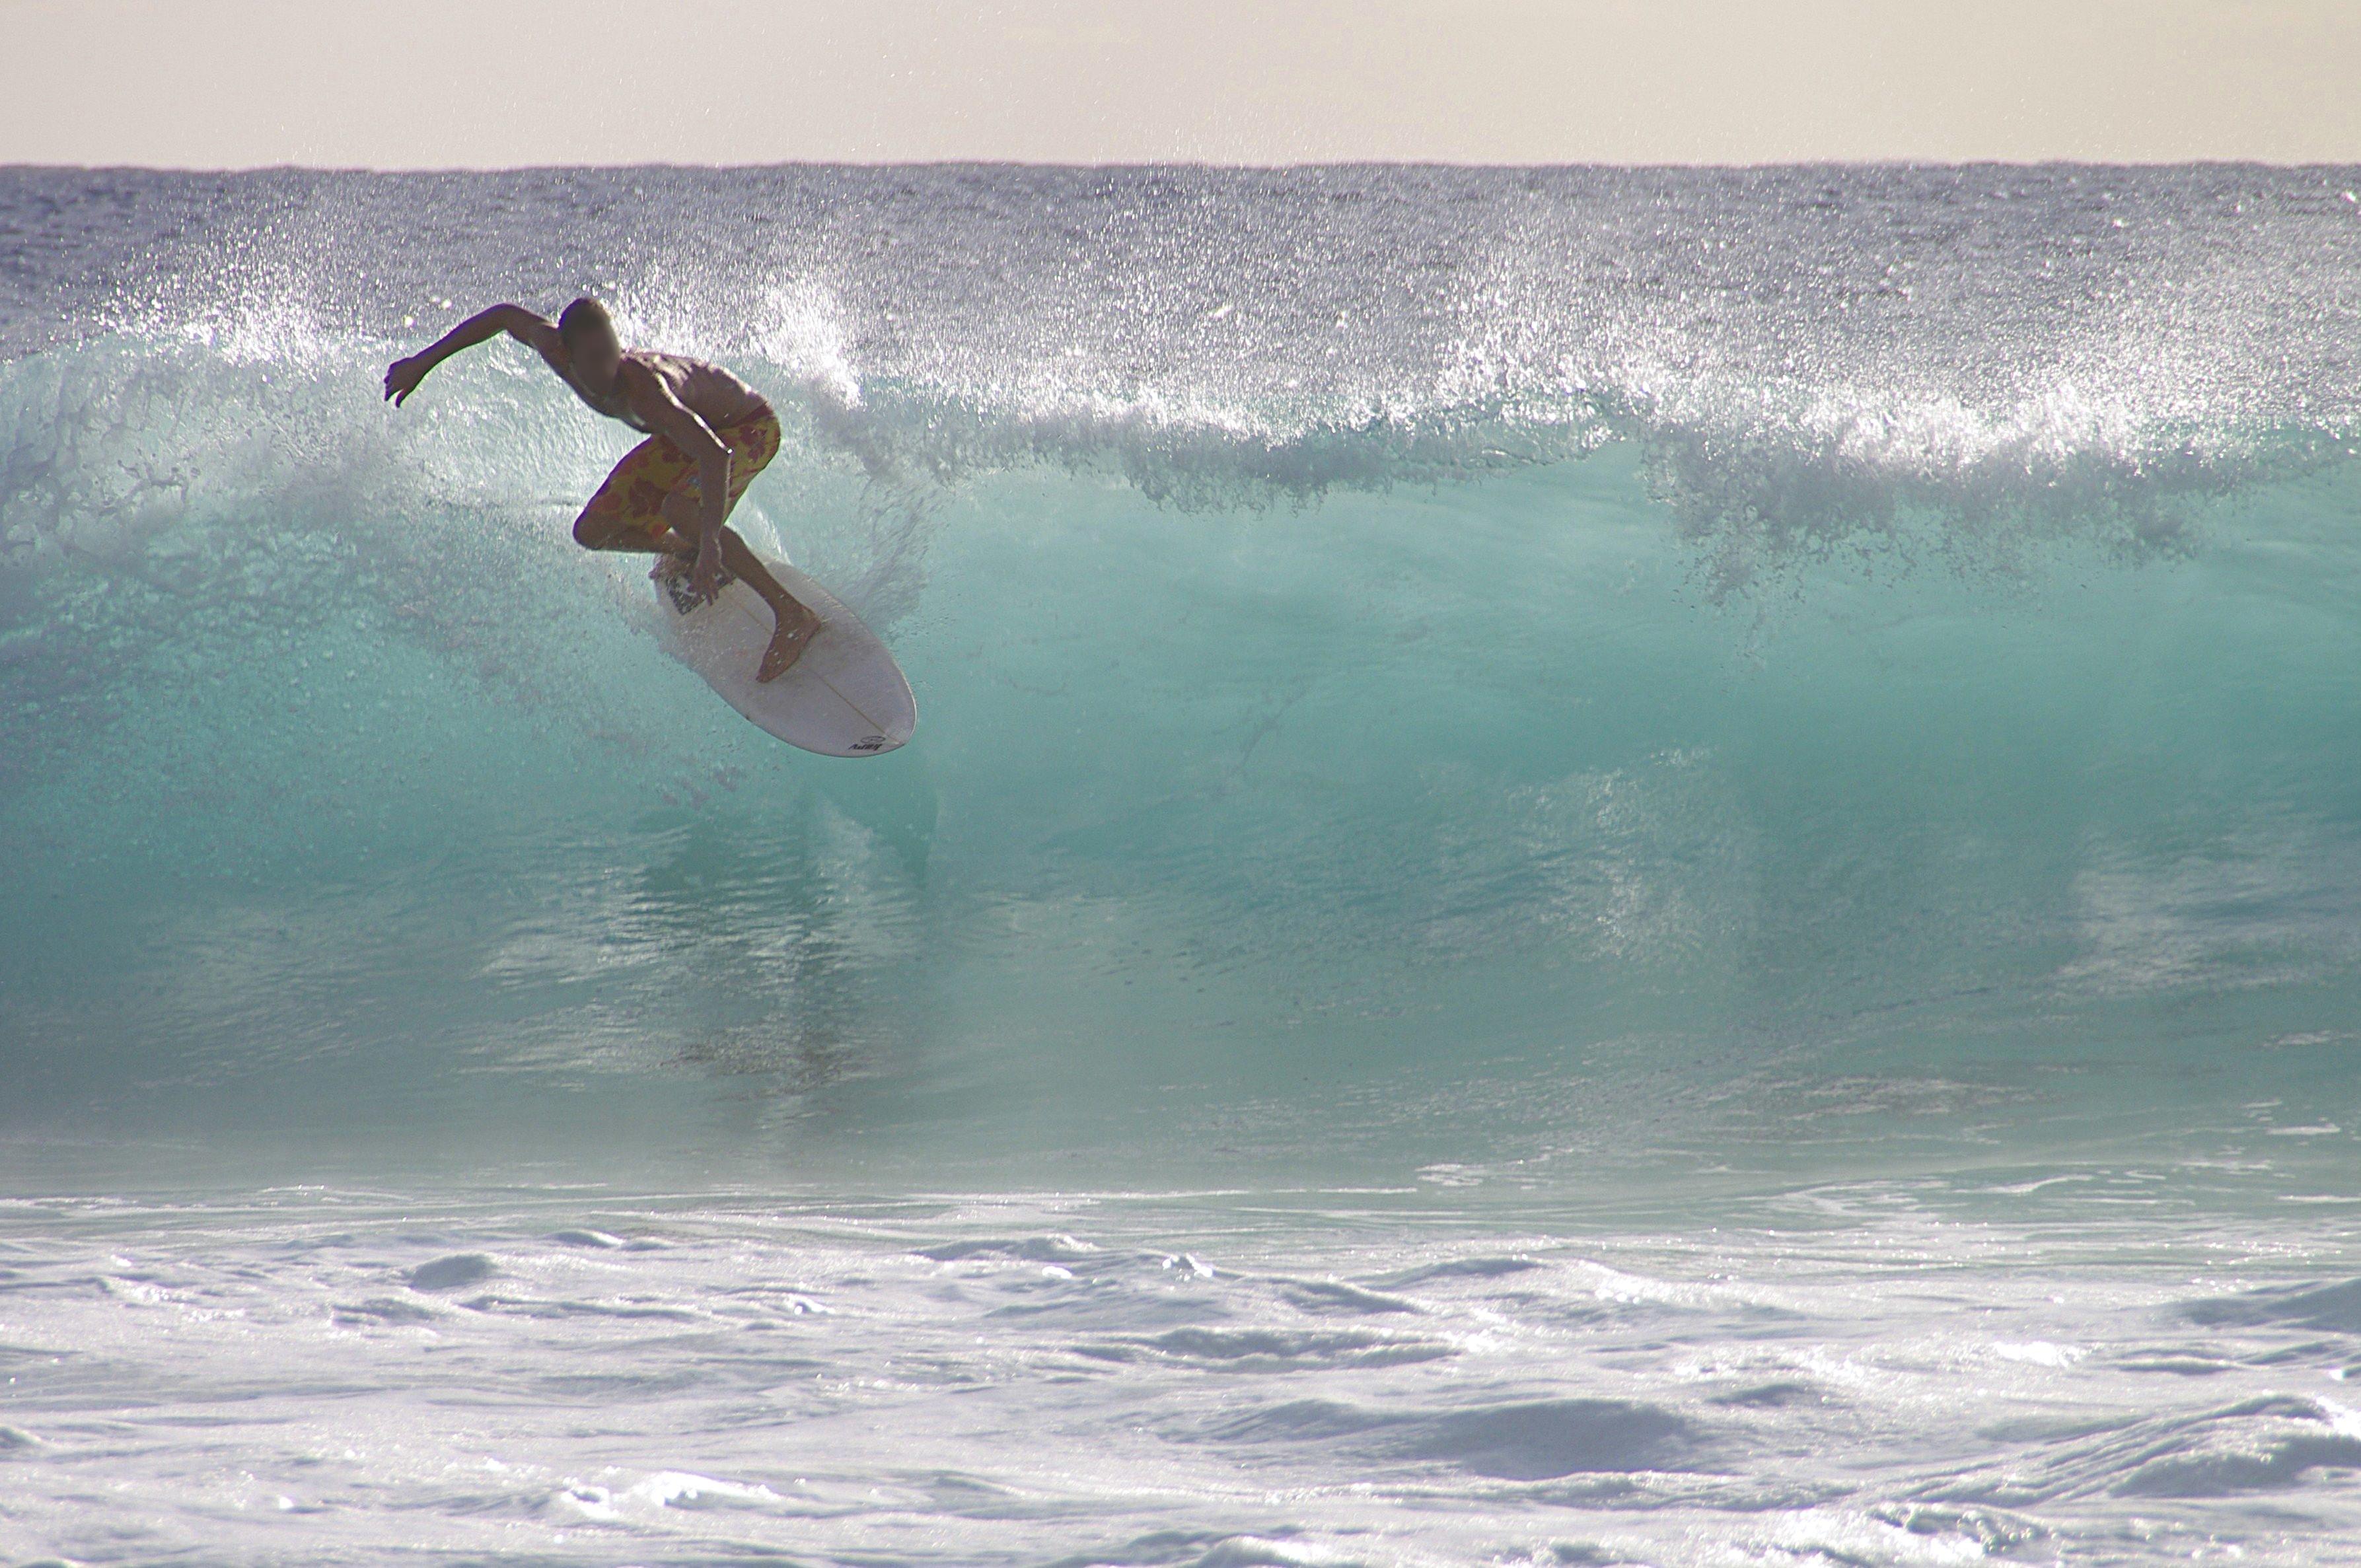 Surfing at Arambol beach